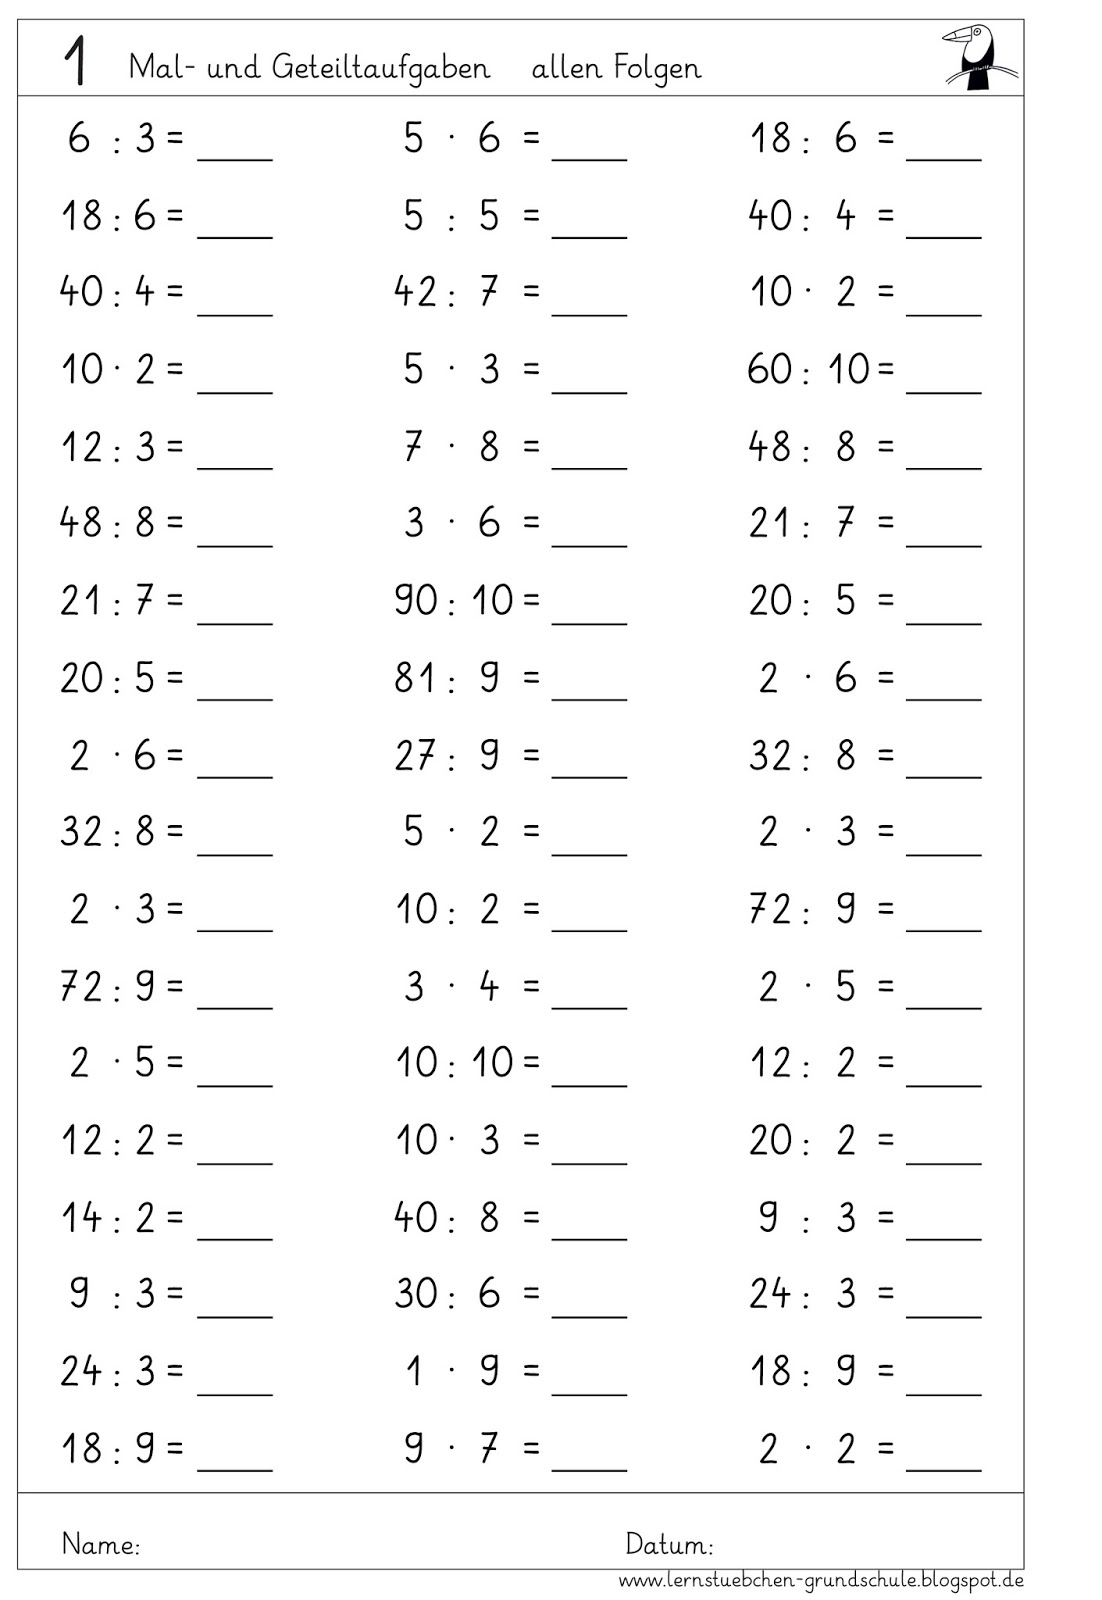 Schulaufgaben 3 klasse mathe